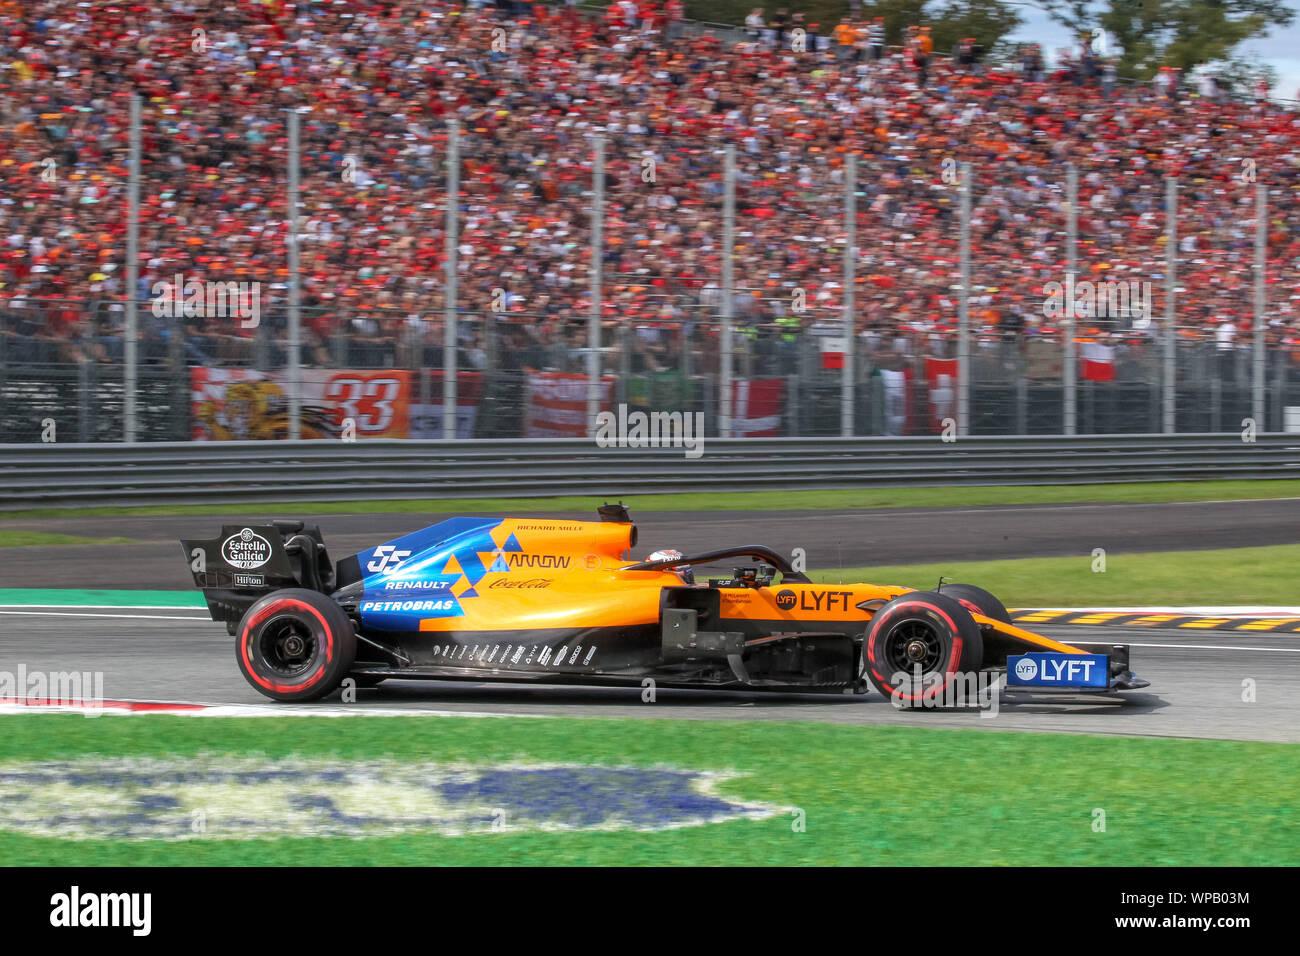 Monza Mb Italy 08 Sep 2019 Carlos Sainz Jr Esp Mclaren F1 Team Mc34 During Grand